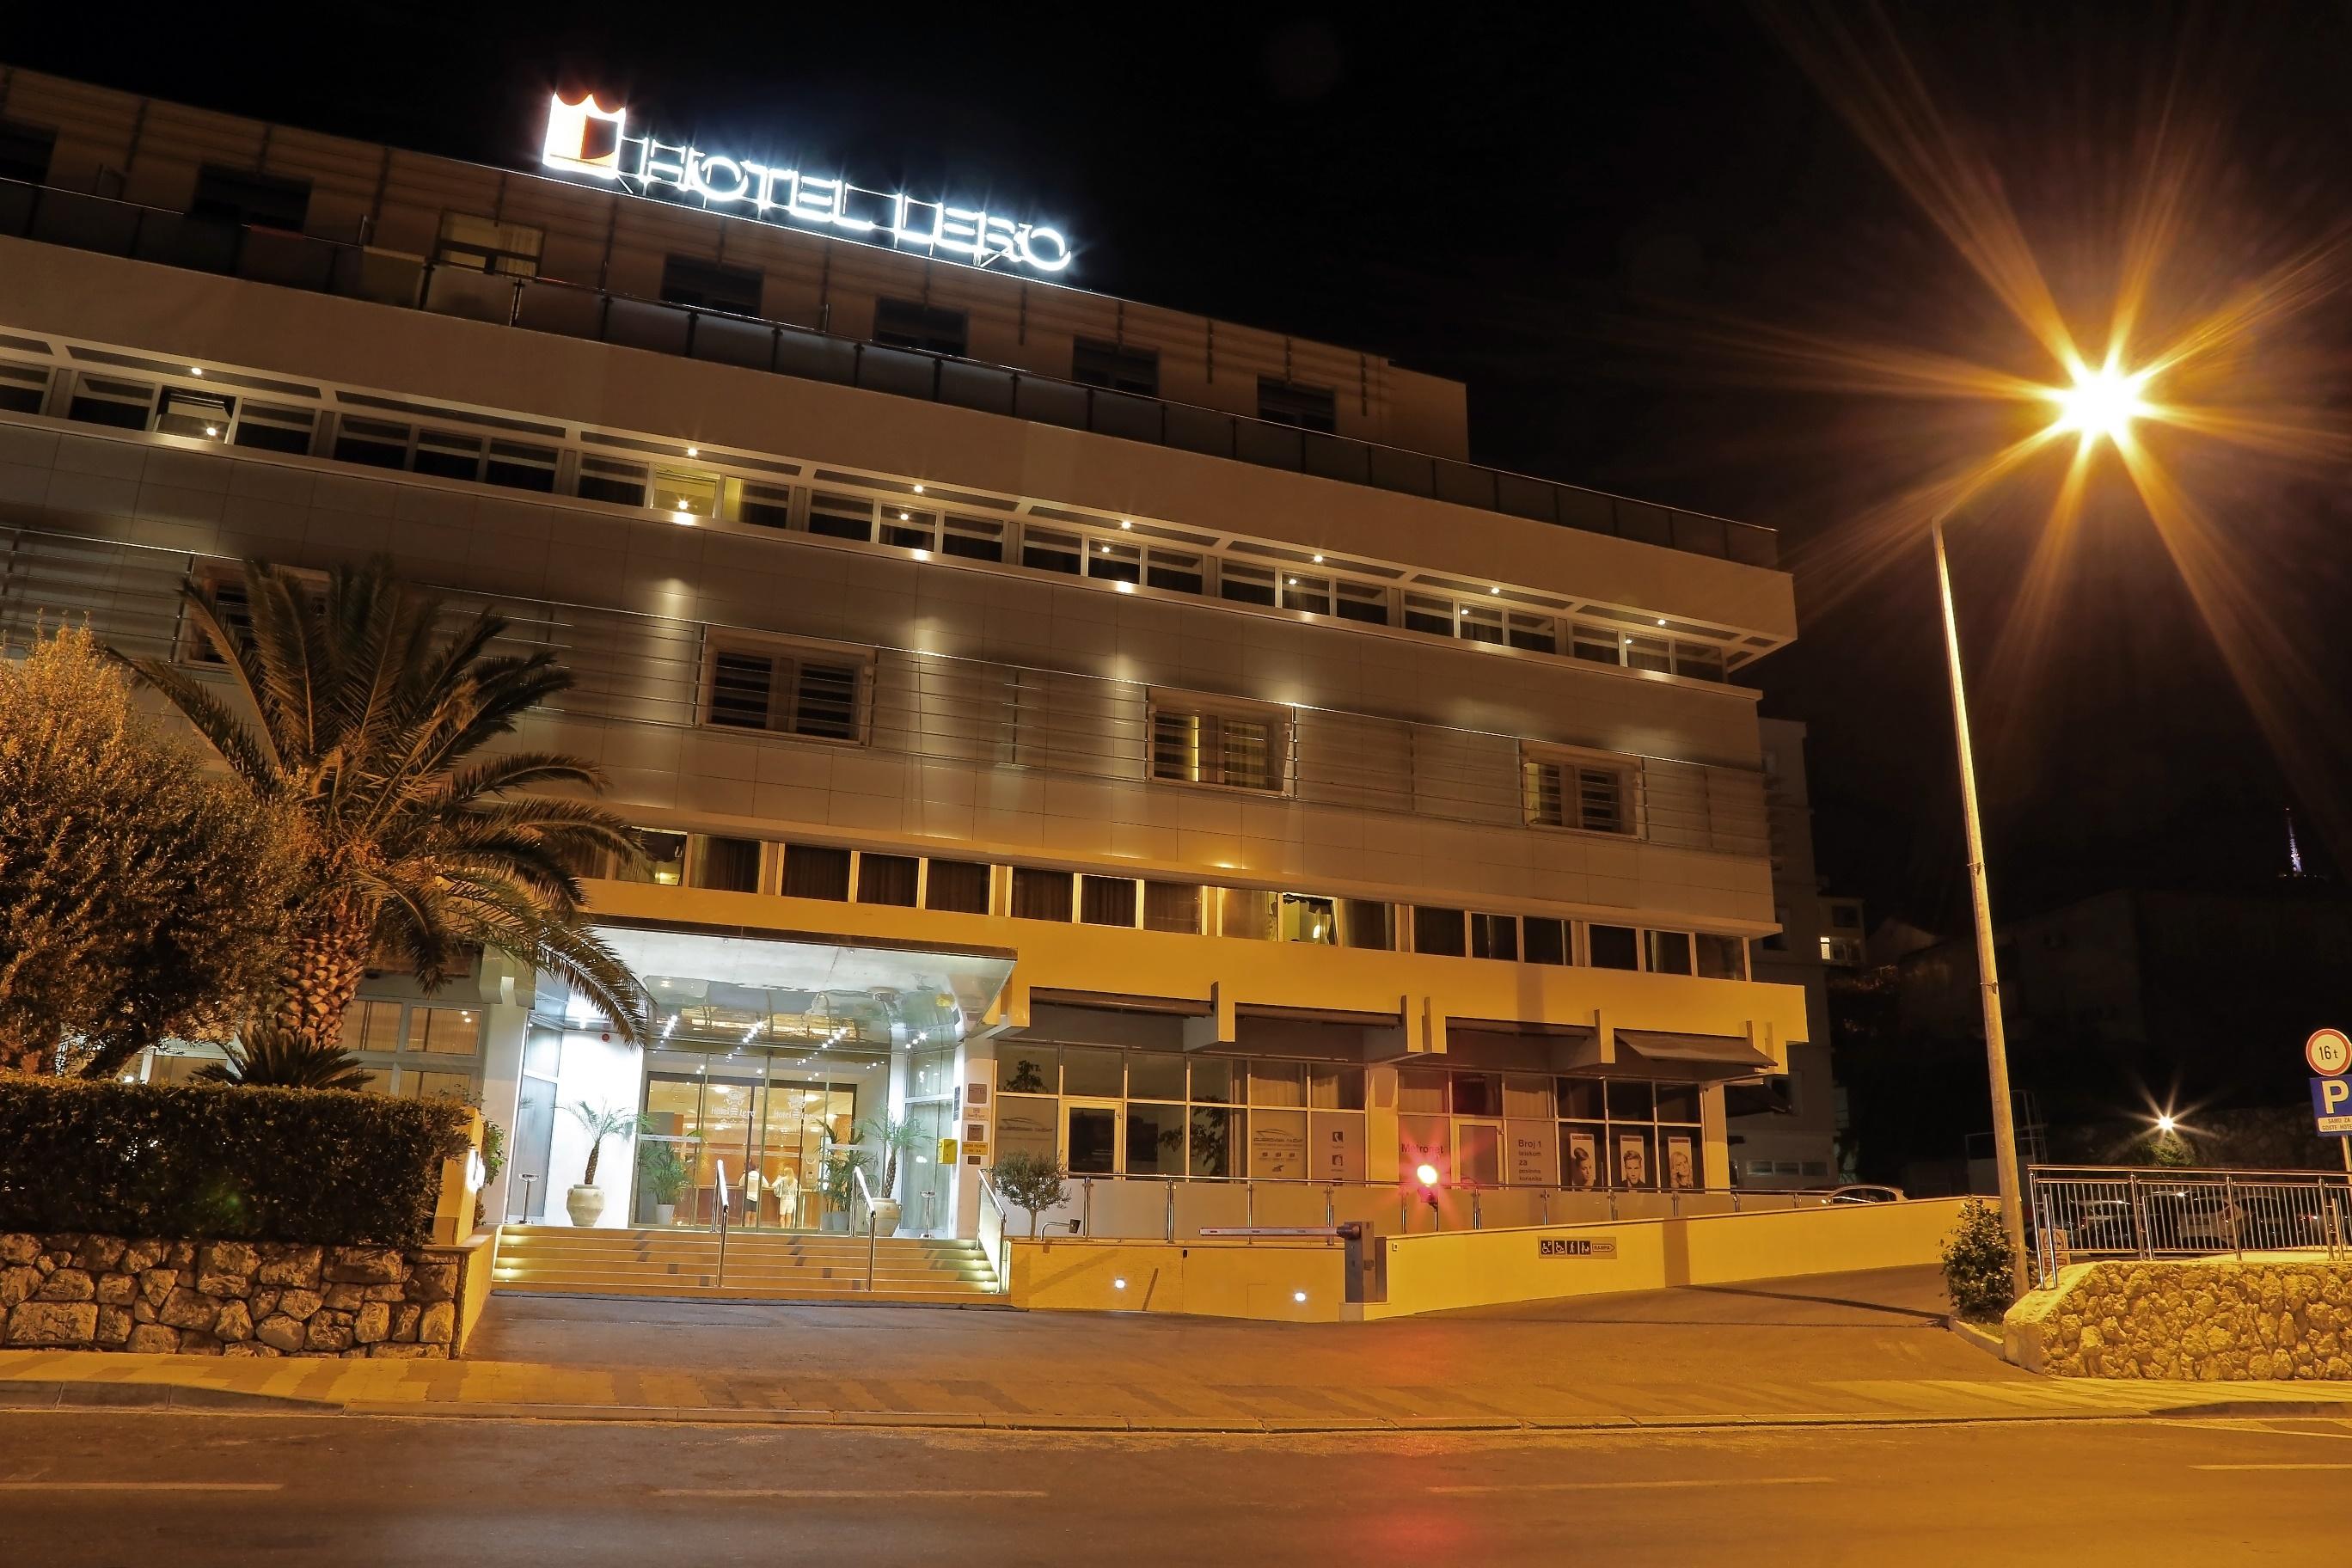 Hotel Lero Dubrovnik 15